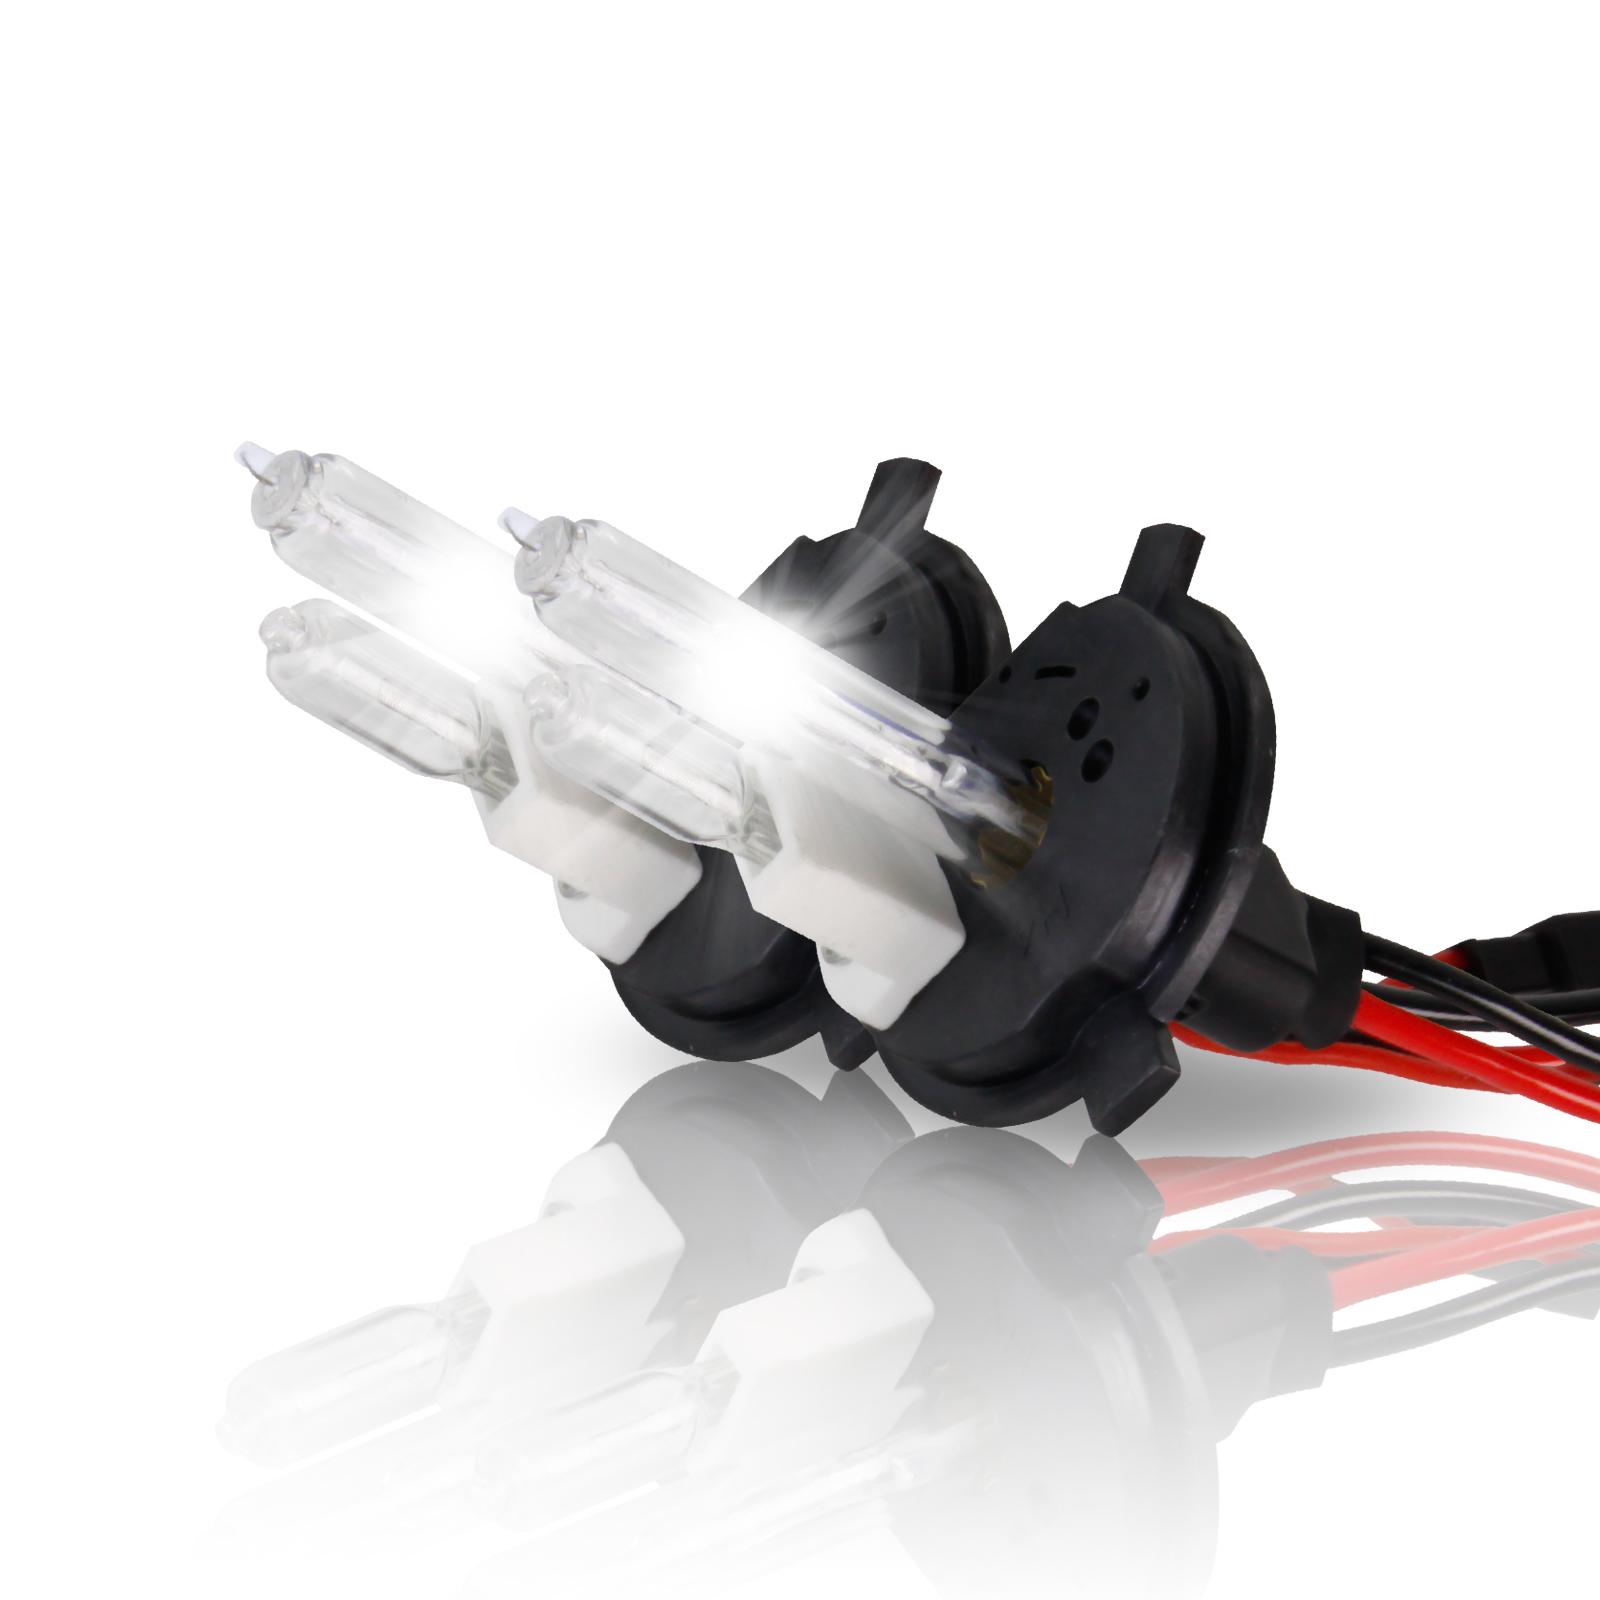 Project RA 35W H4 5000K Xenon White HID Headlight Bulbs - 9003 Hi / Low HID Replacement Bulbs - Pair